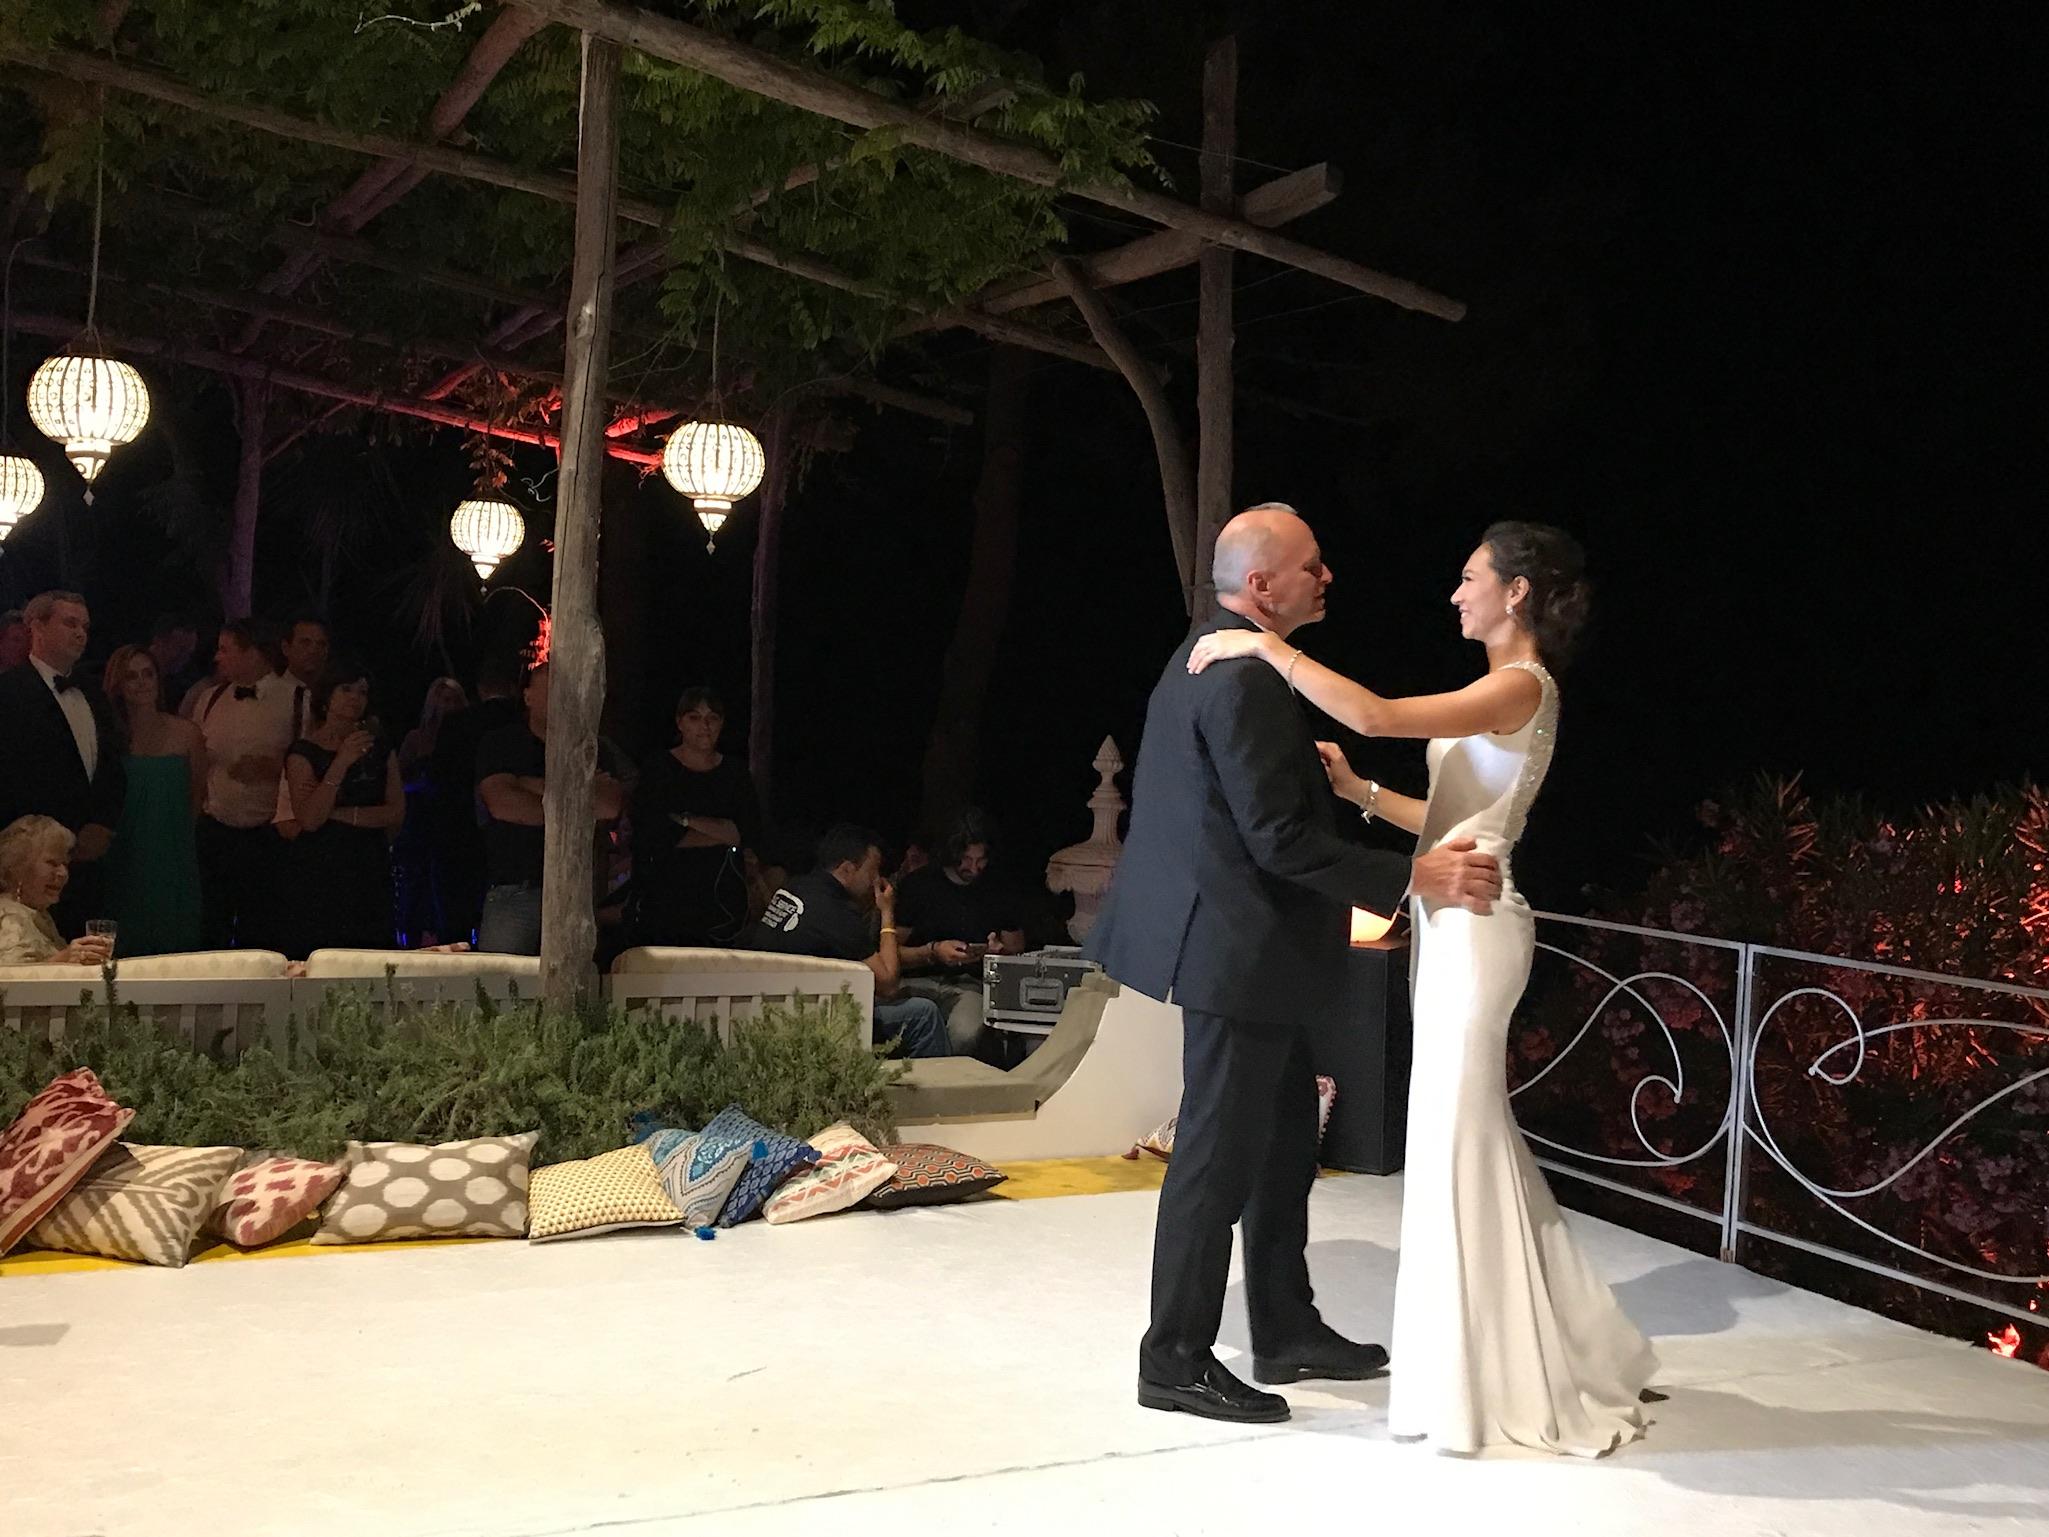 http://www.weddingamalfi.com/wp-content/uploads/Nathalie-and-Benjamin-wedding-in-Positano-6.jpg